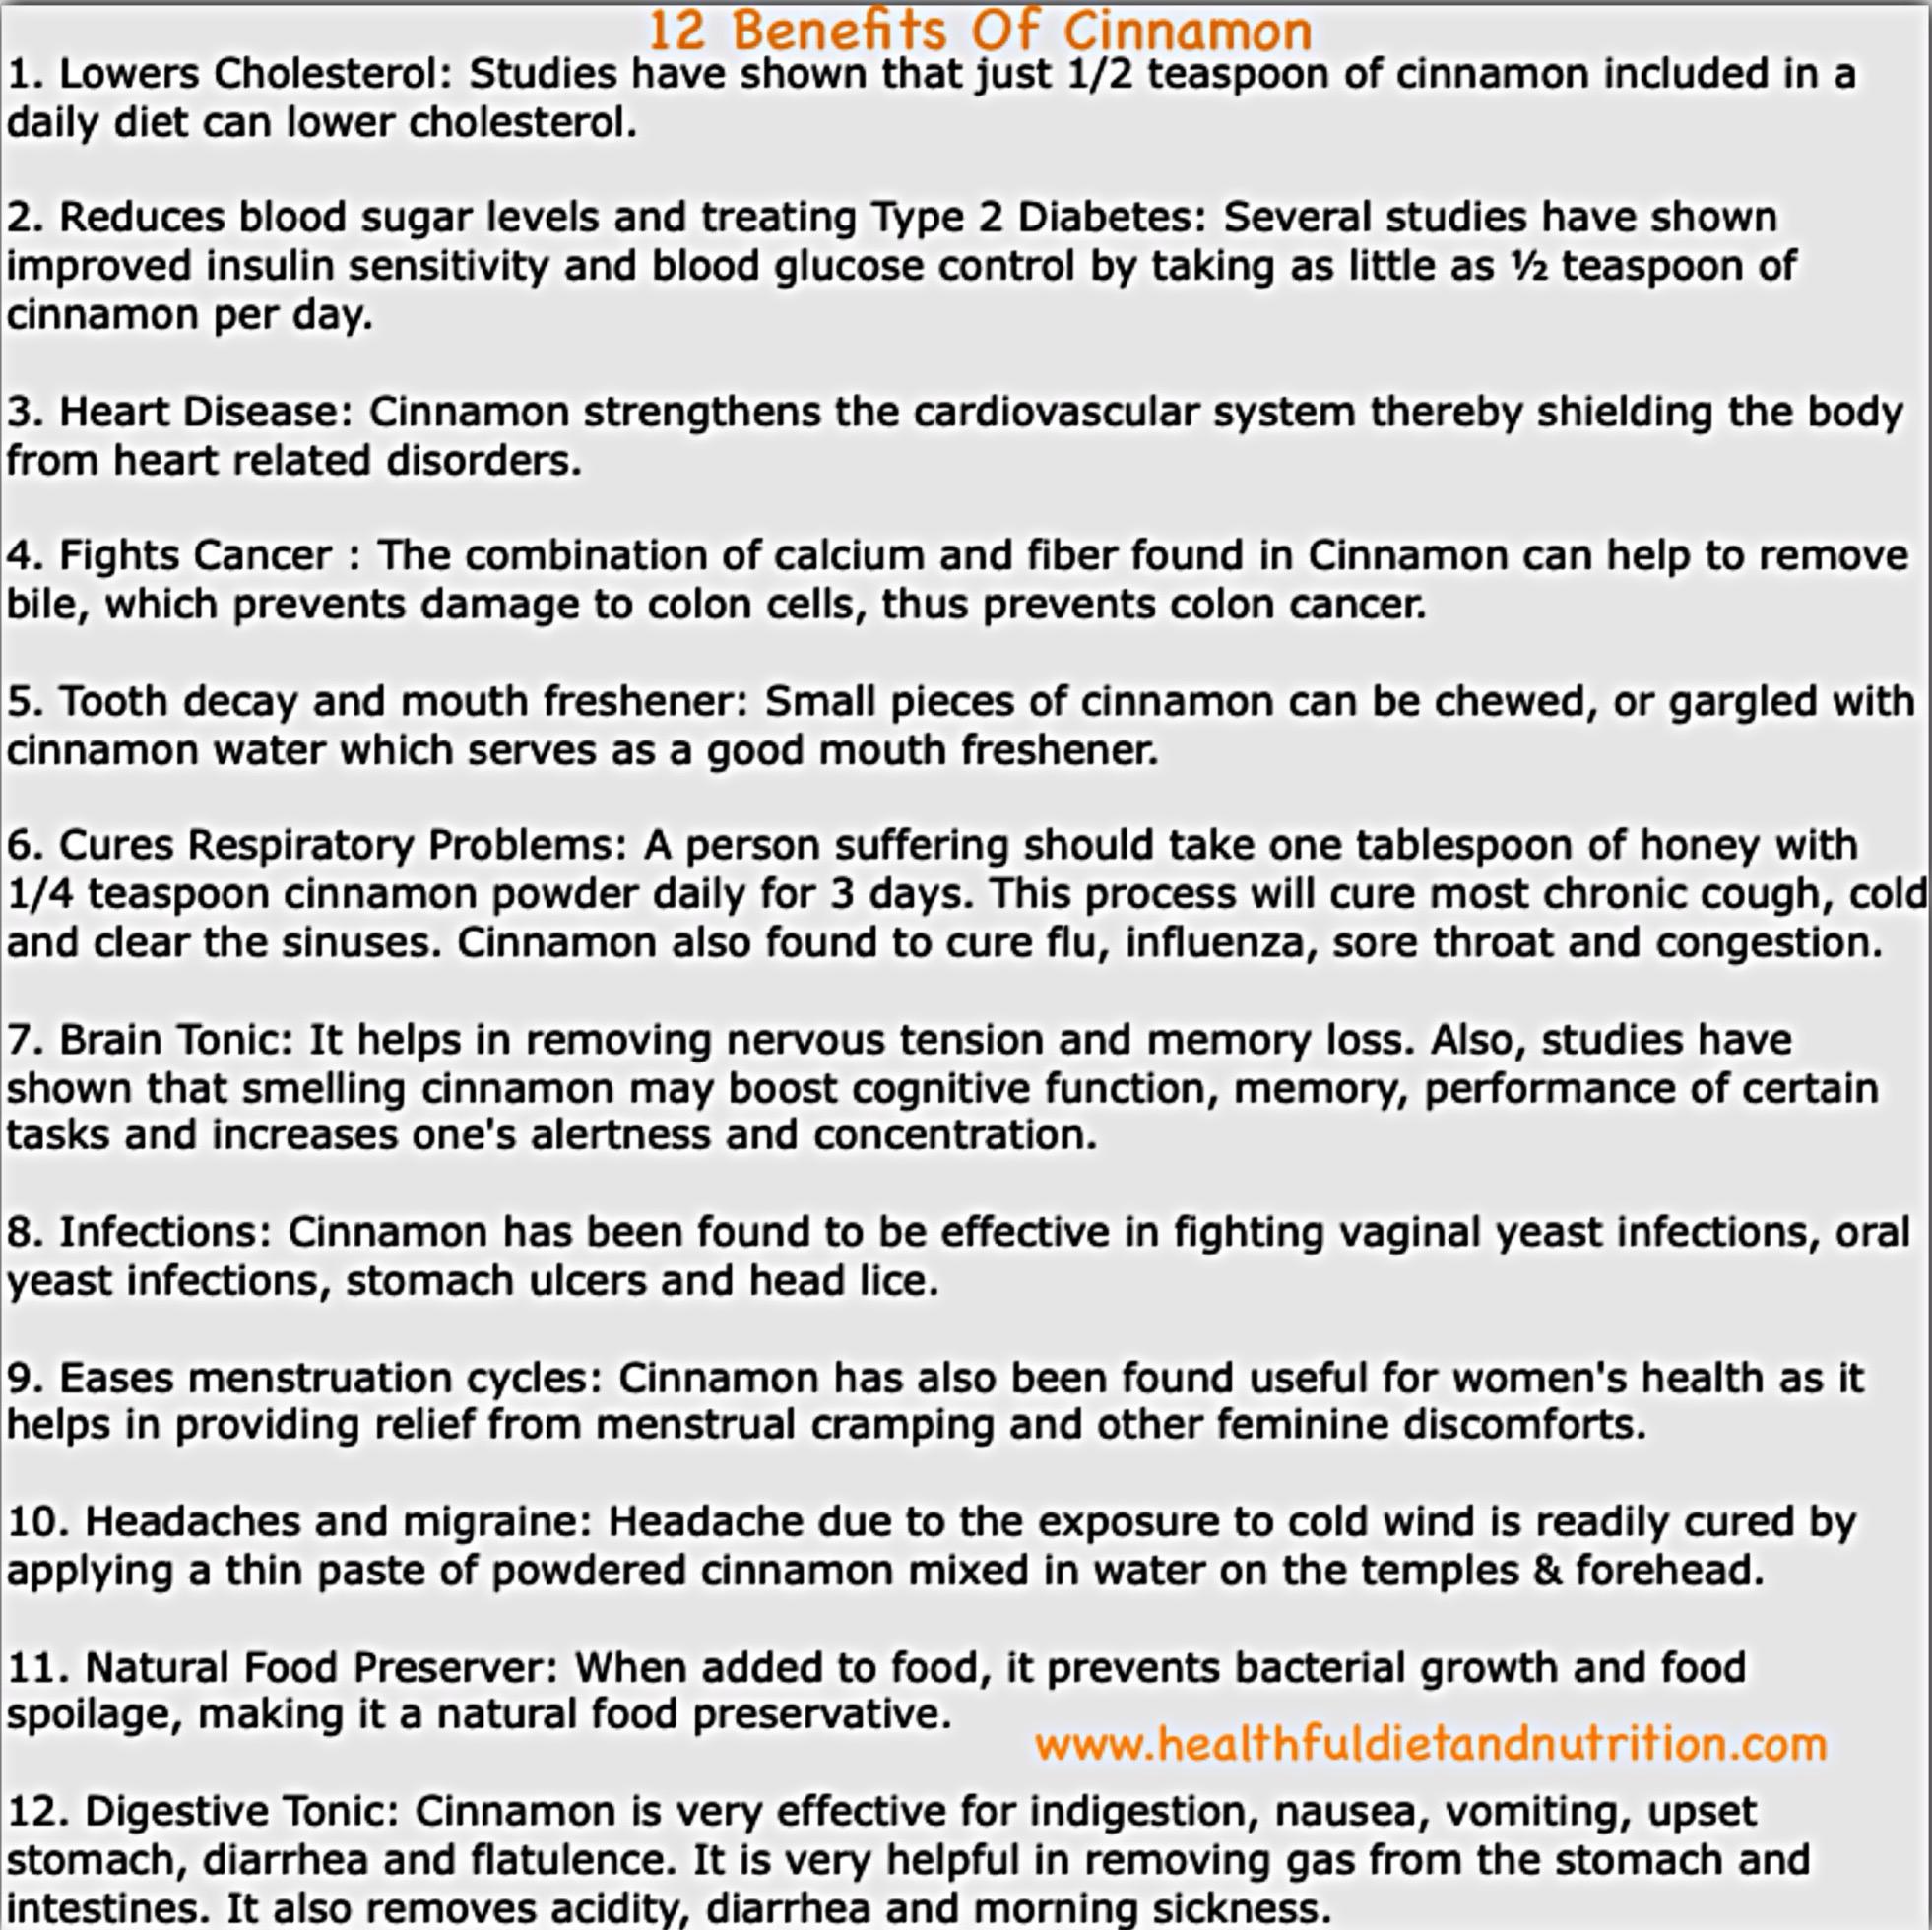 12 Benefits of Cinnamon